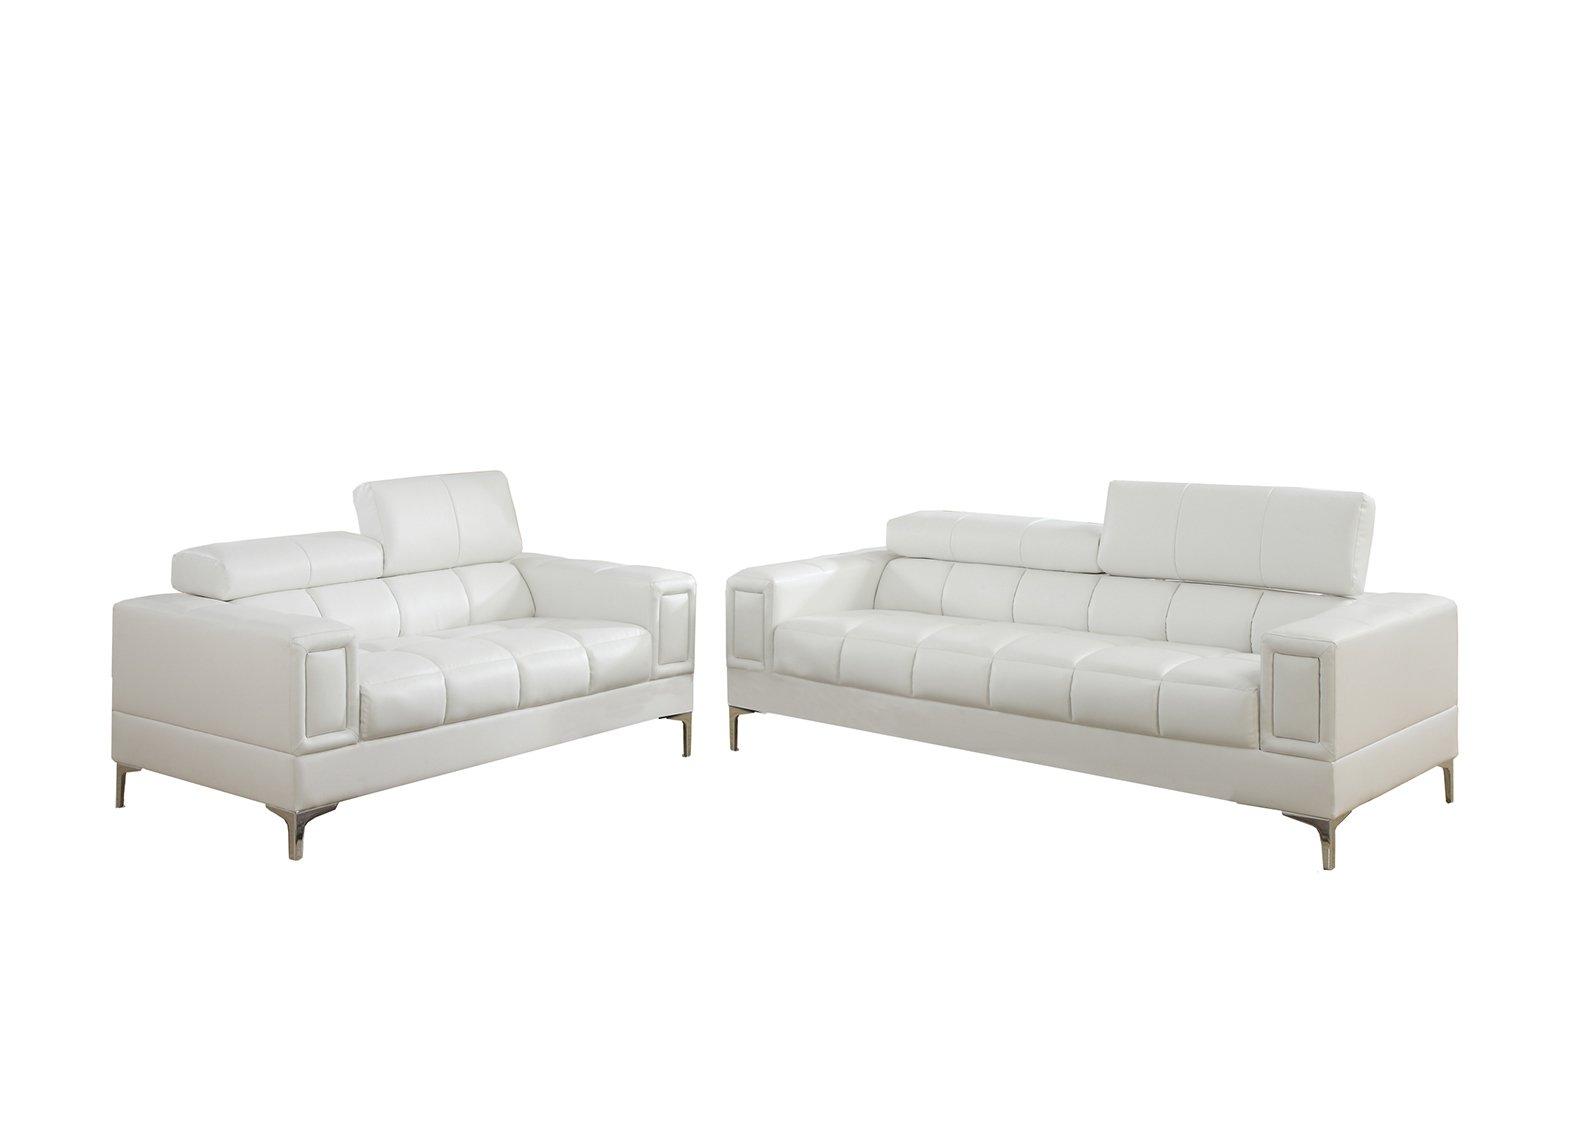 Poundex F7240 Bobkona Sierra Bonded Leather 2 Piece Sofa And Loveseat Set, White by Poundex